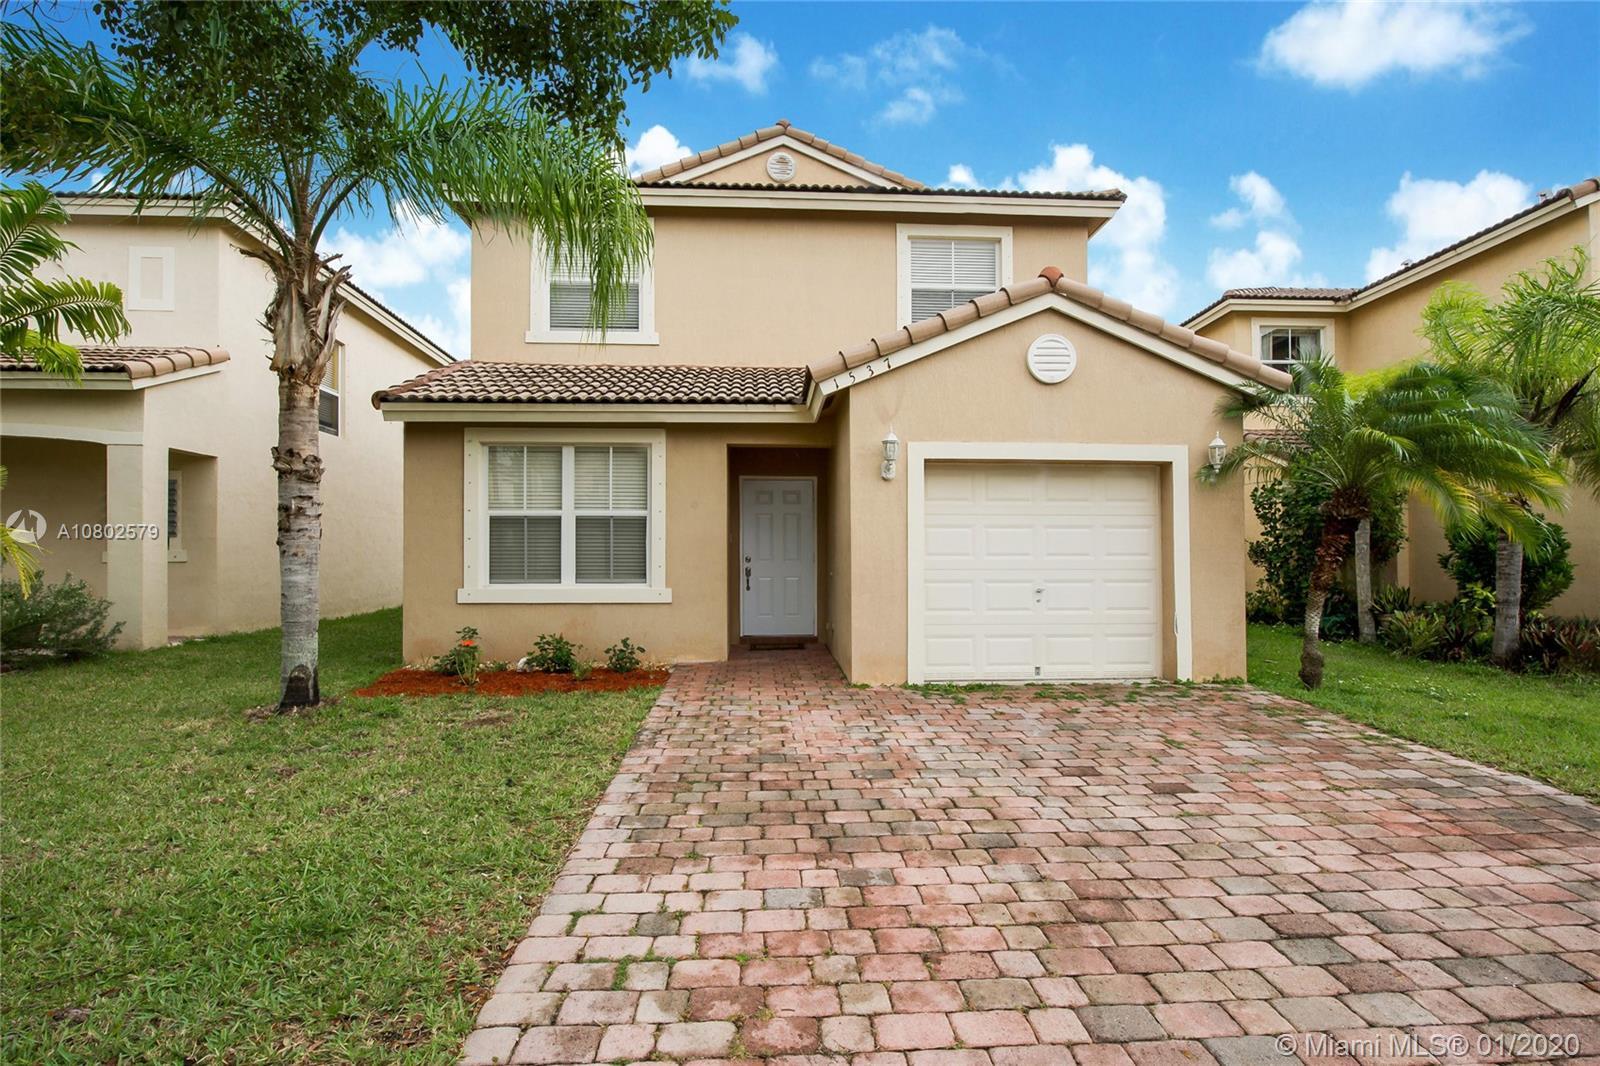 1537 SE 20th Rd, Homestead, FL 33035 - Homestead, FL real estate listing